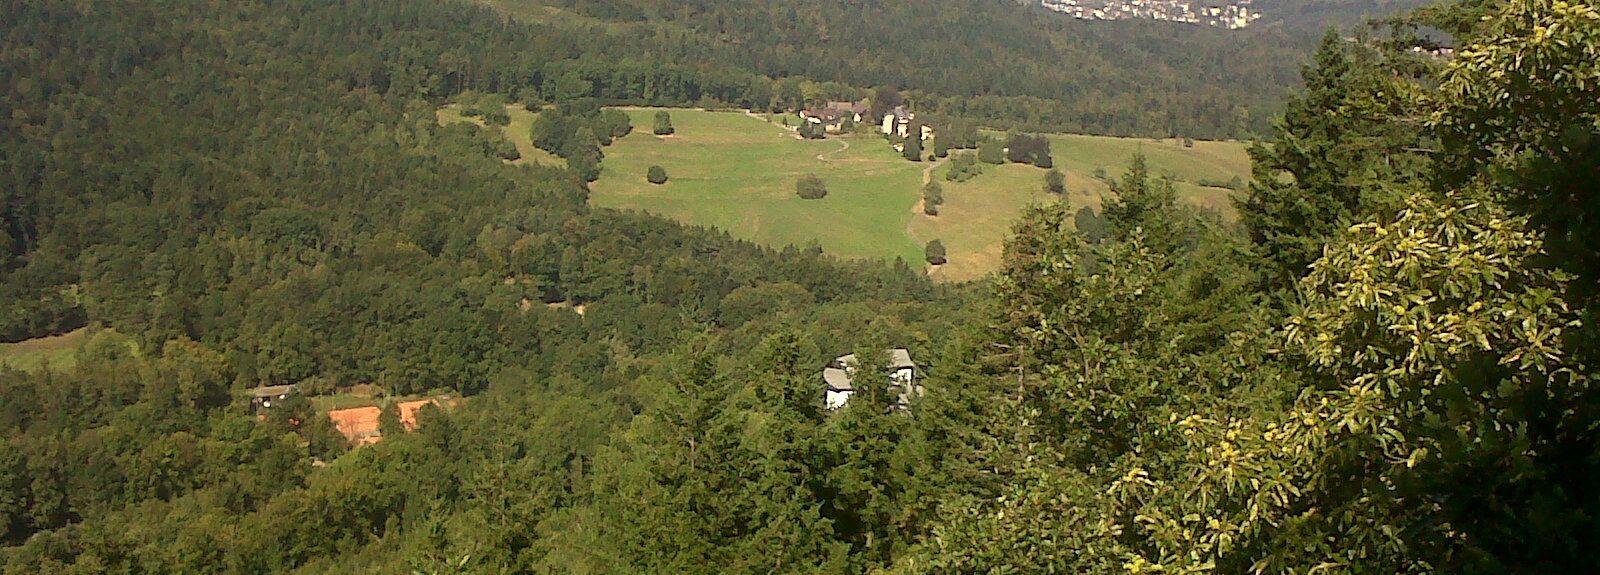 Weisenbach, Baden-Württemberg, Germania